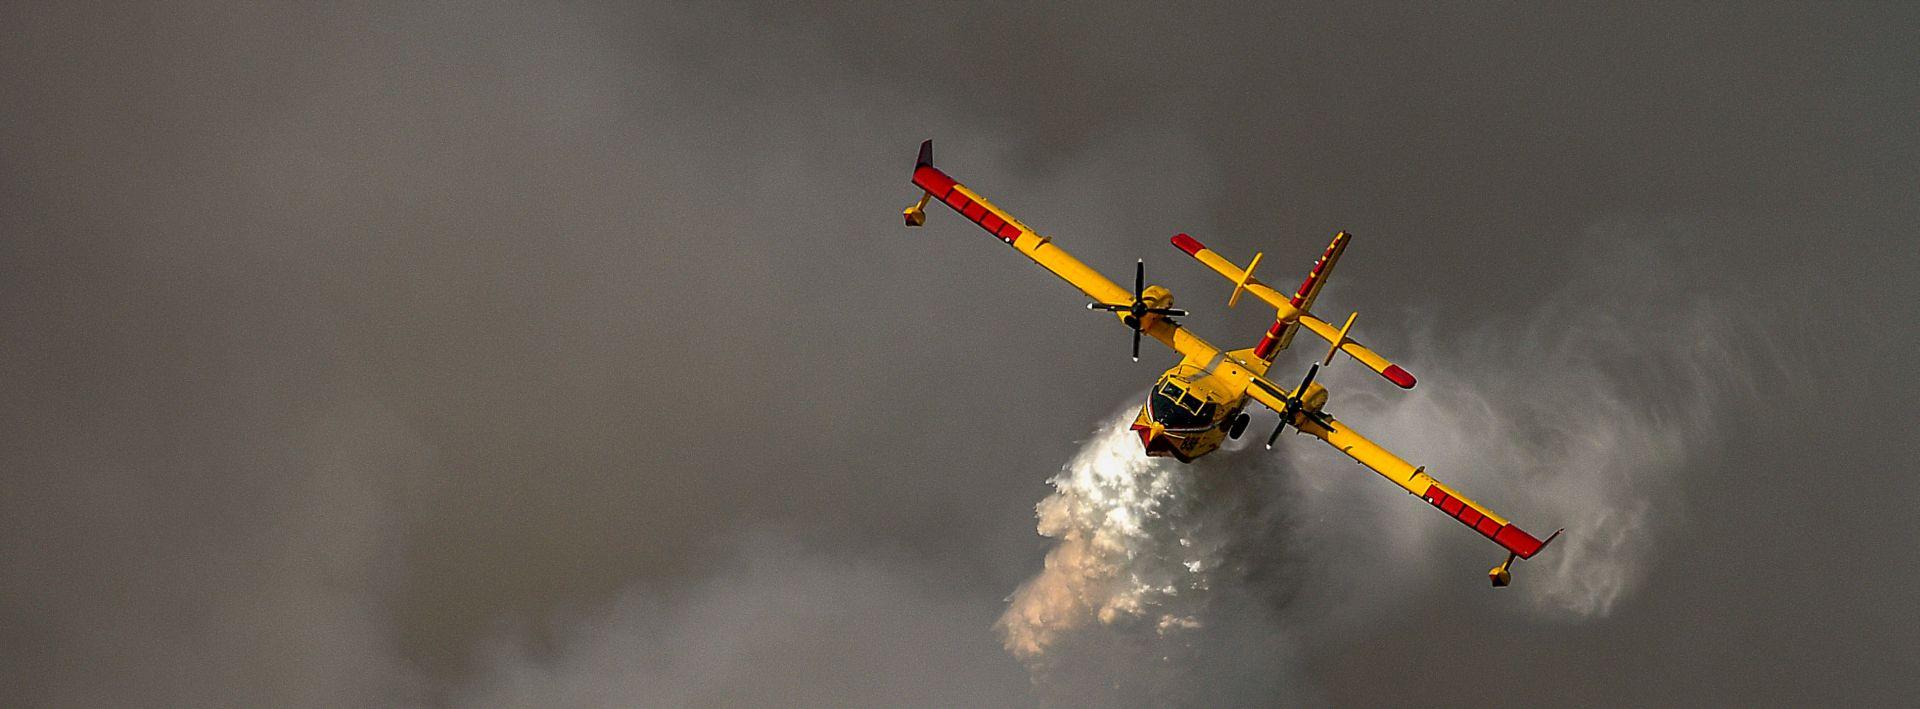 Spremno 1.116 profesionalnih i 5.076 dobrovoljnih vatrogasaca